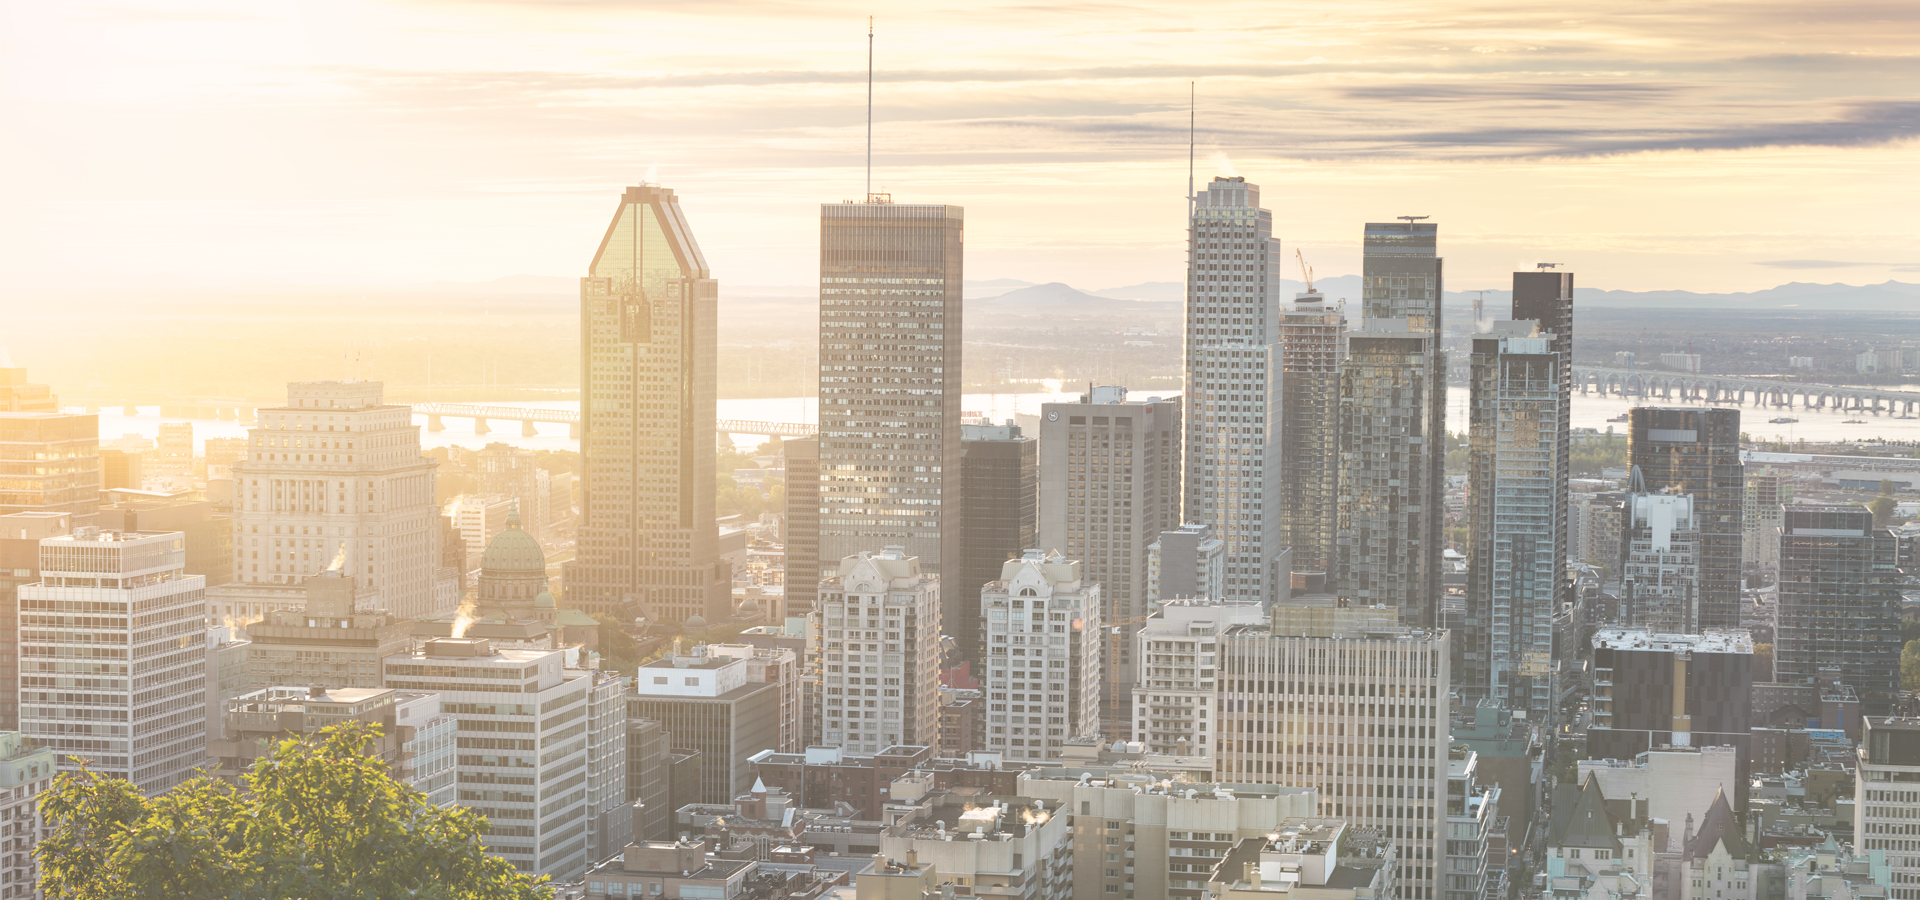 Peer-to-peer advisory in Montreal, Quebec, Canada